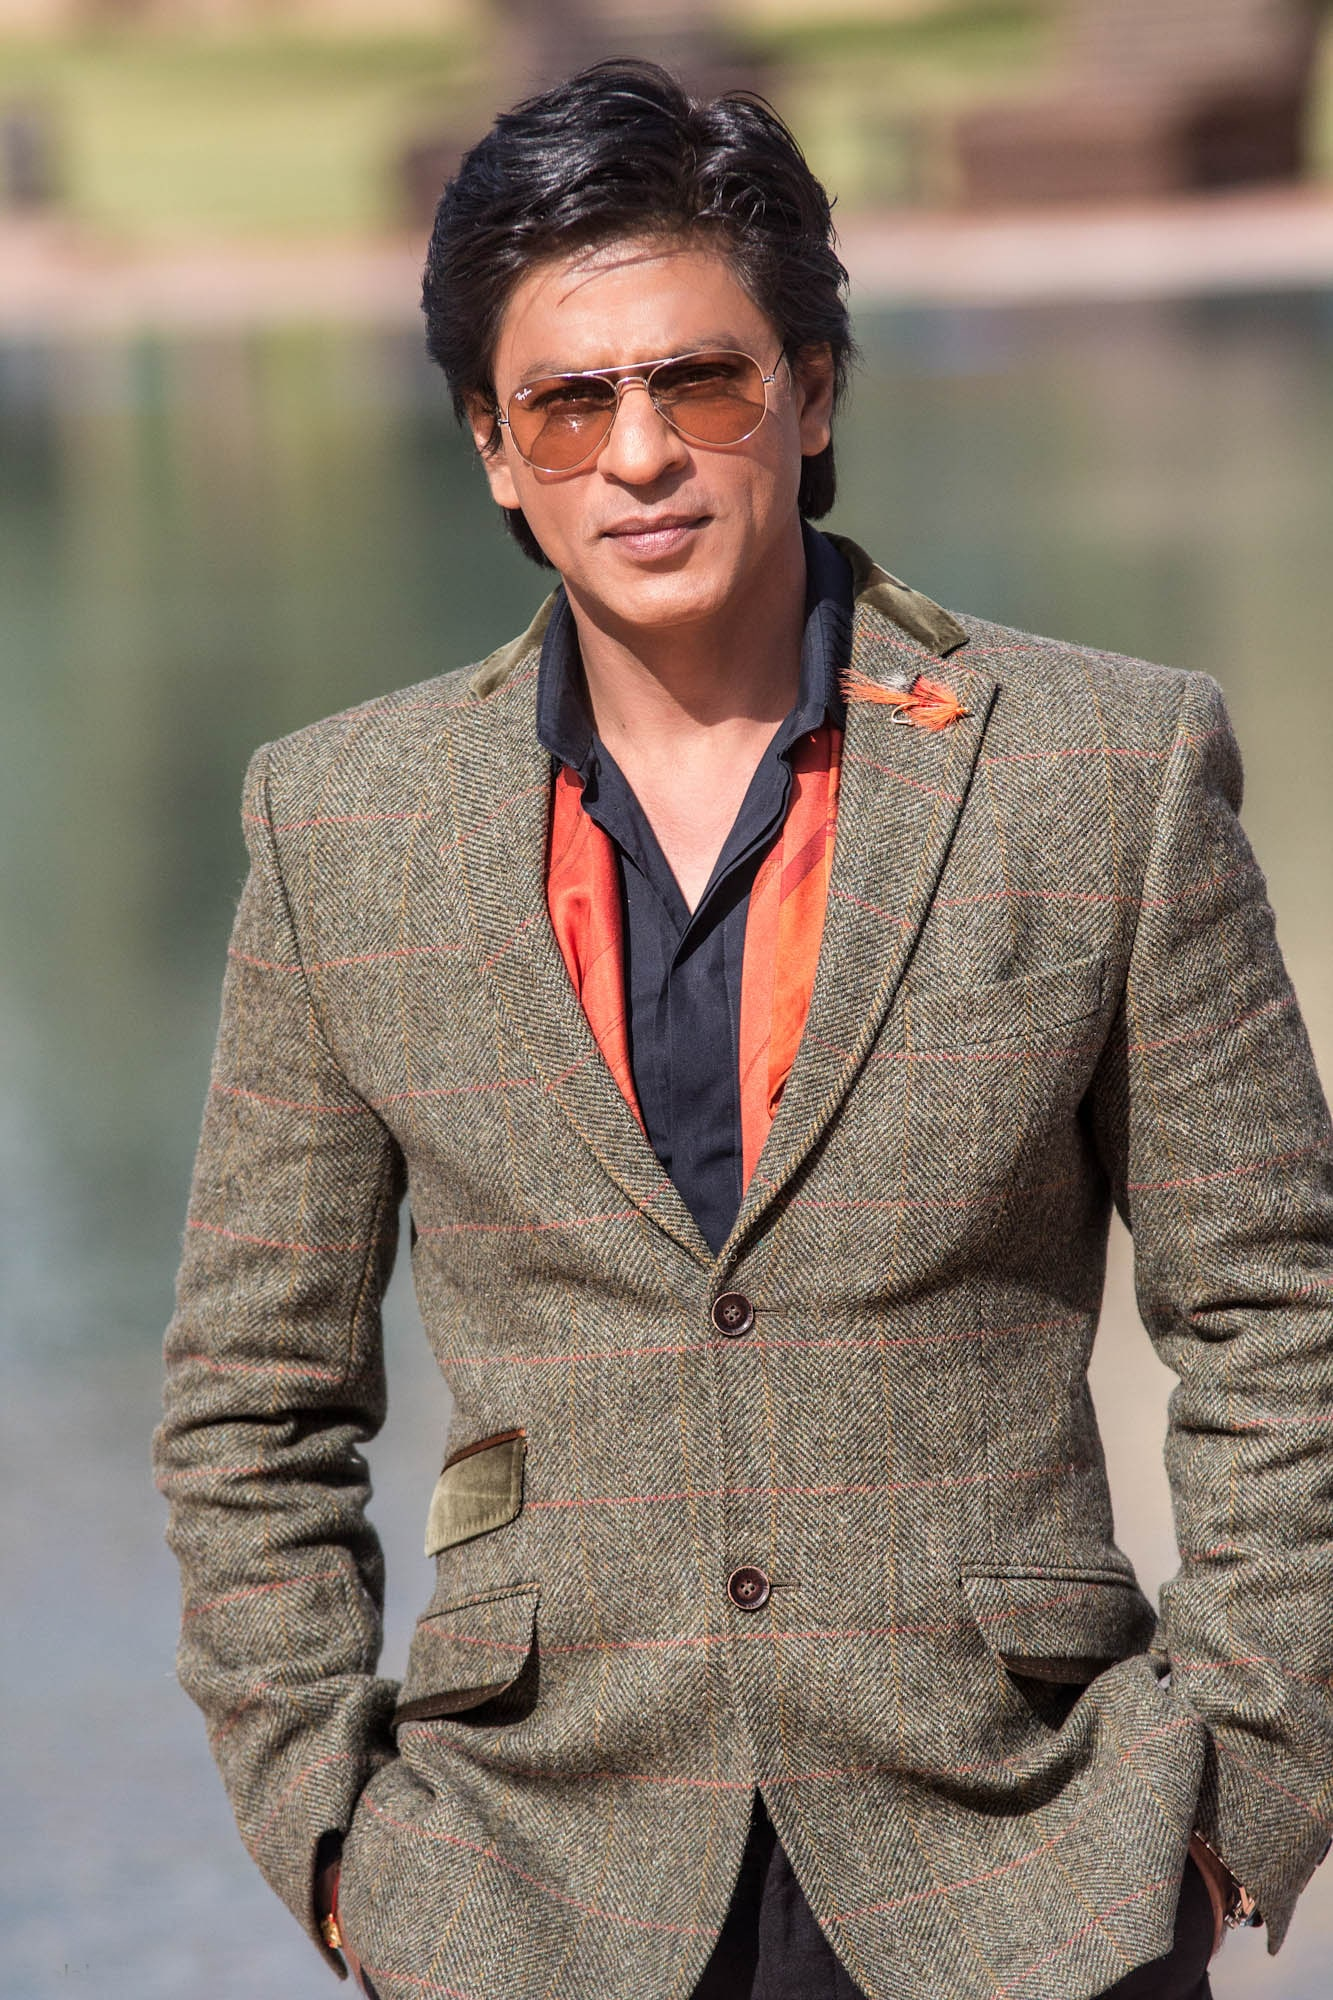 Shah Rukh Khan Wallpapers